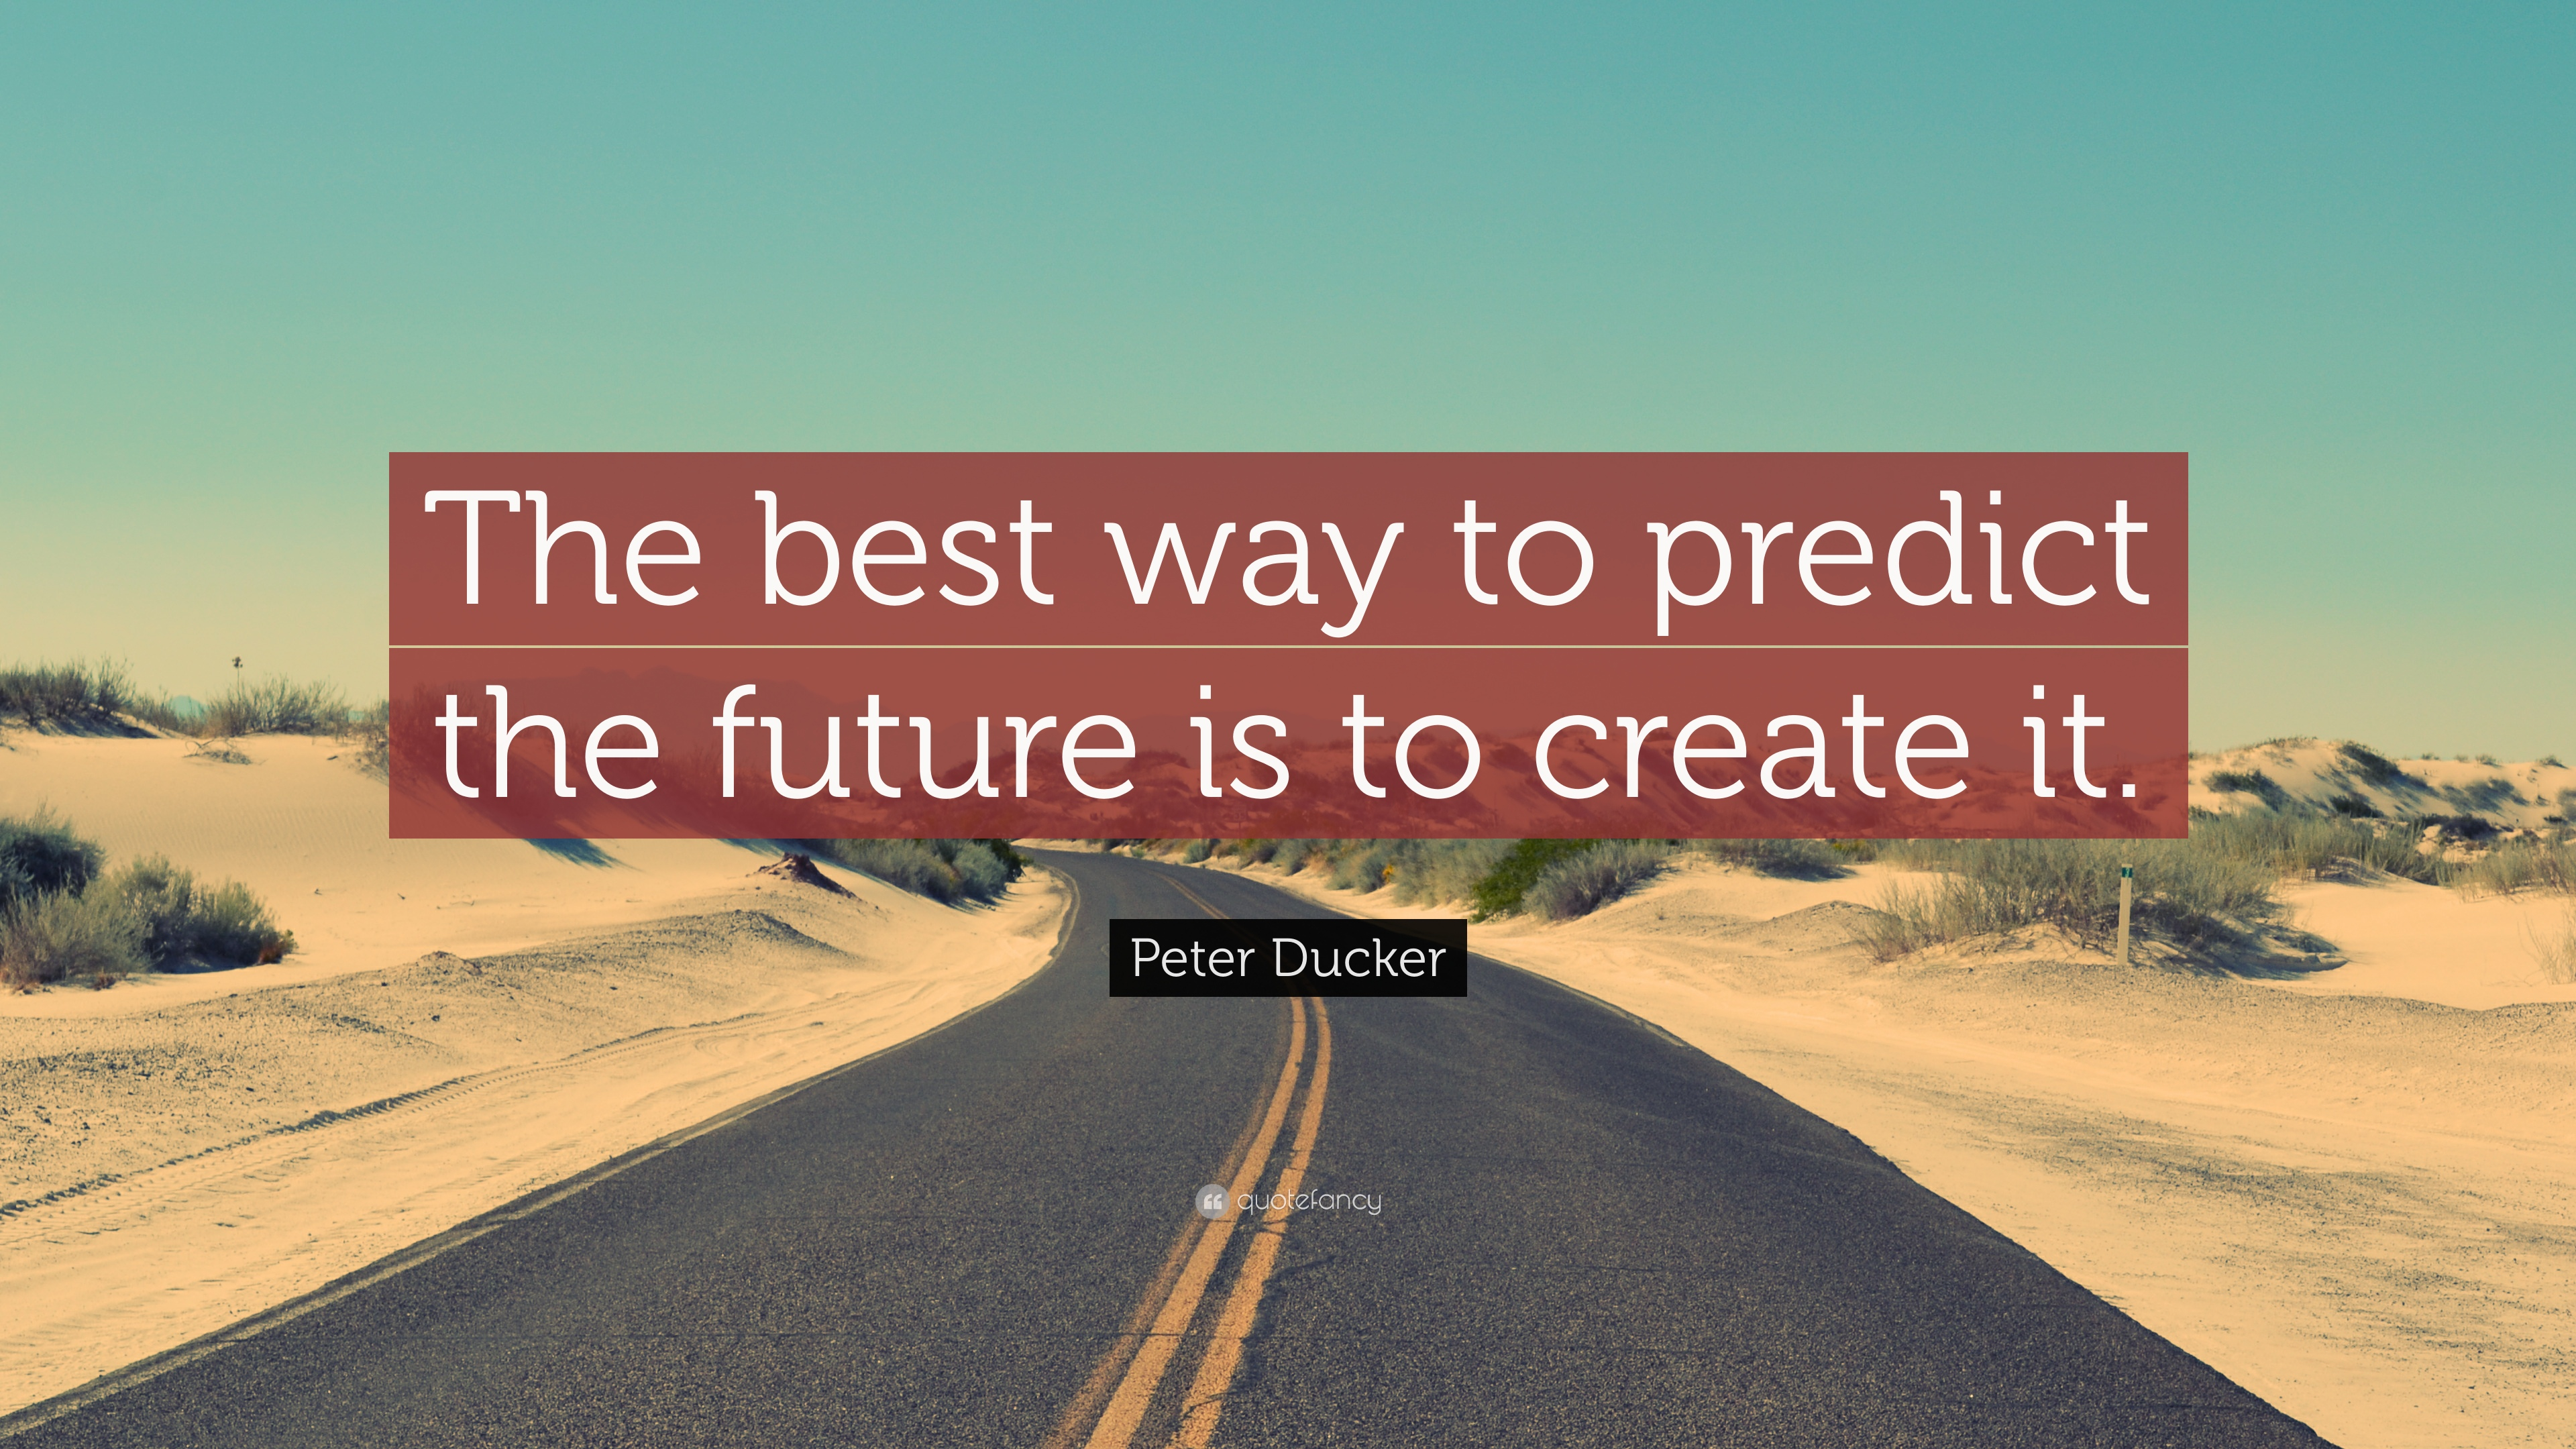 predict quotes like success